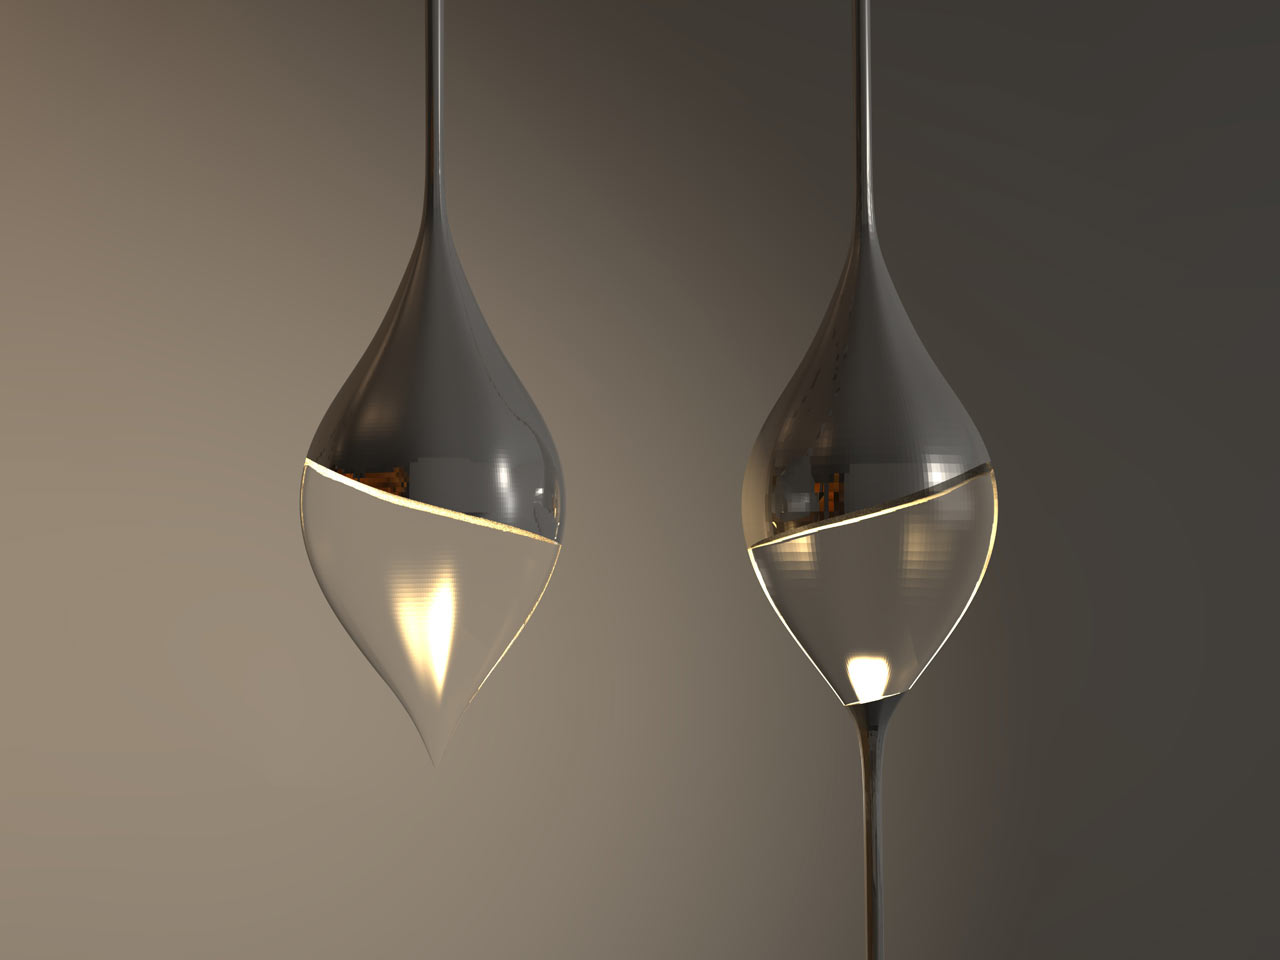 Stalasso Lighting by Joeri Claeys